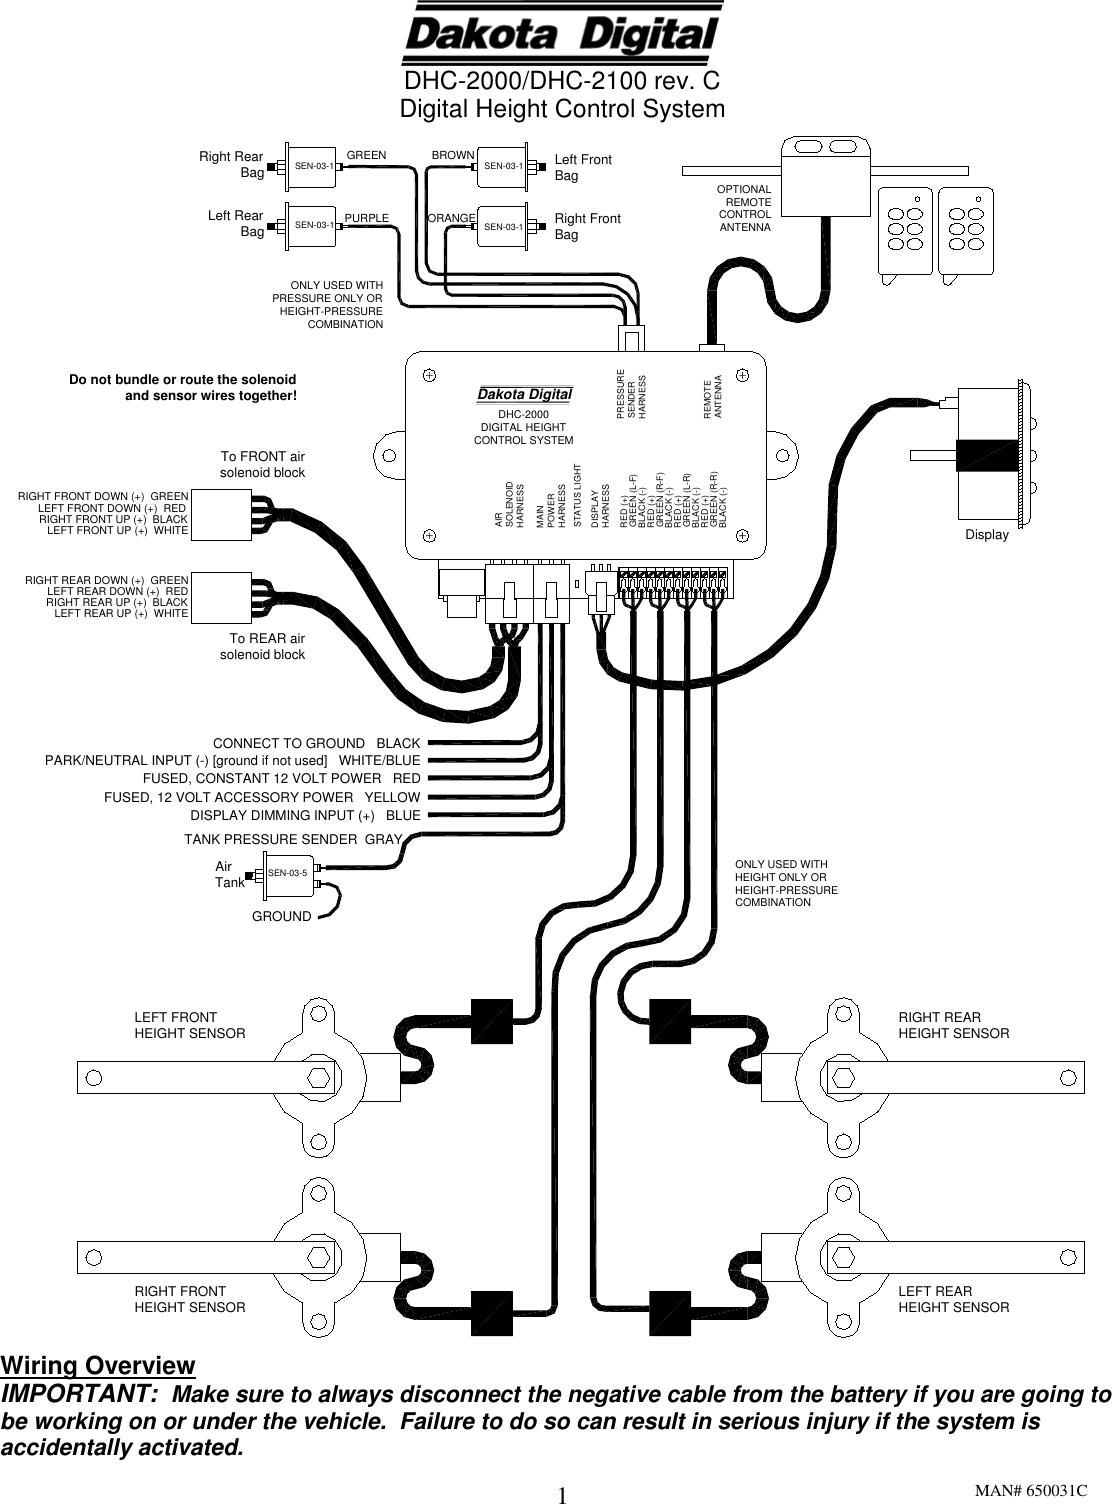 wiring diagram on painless wiring harness diagram gm 68 firebird